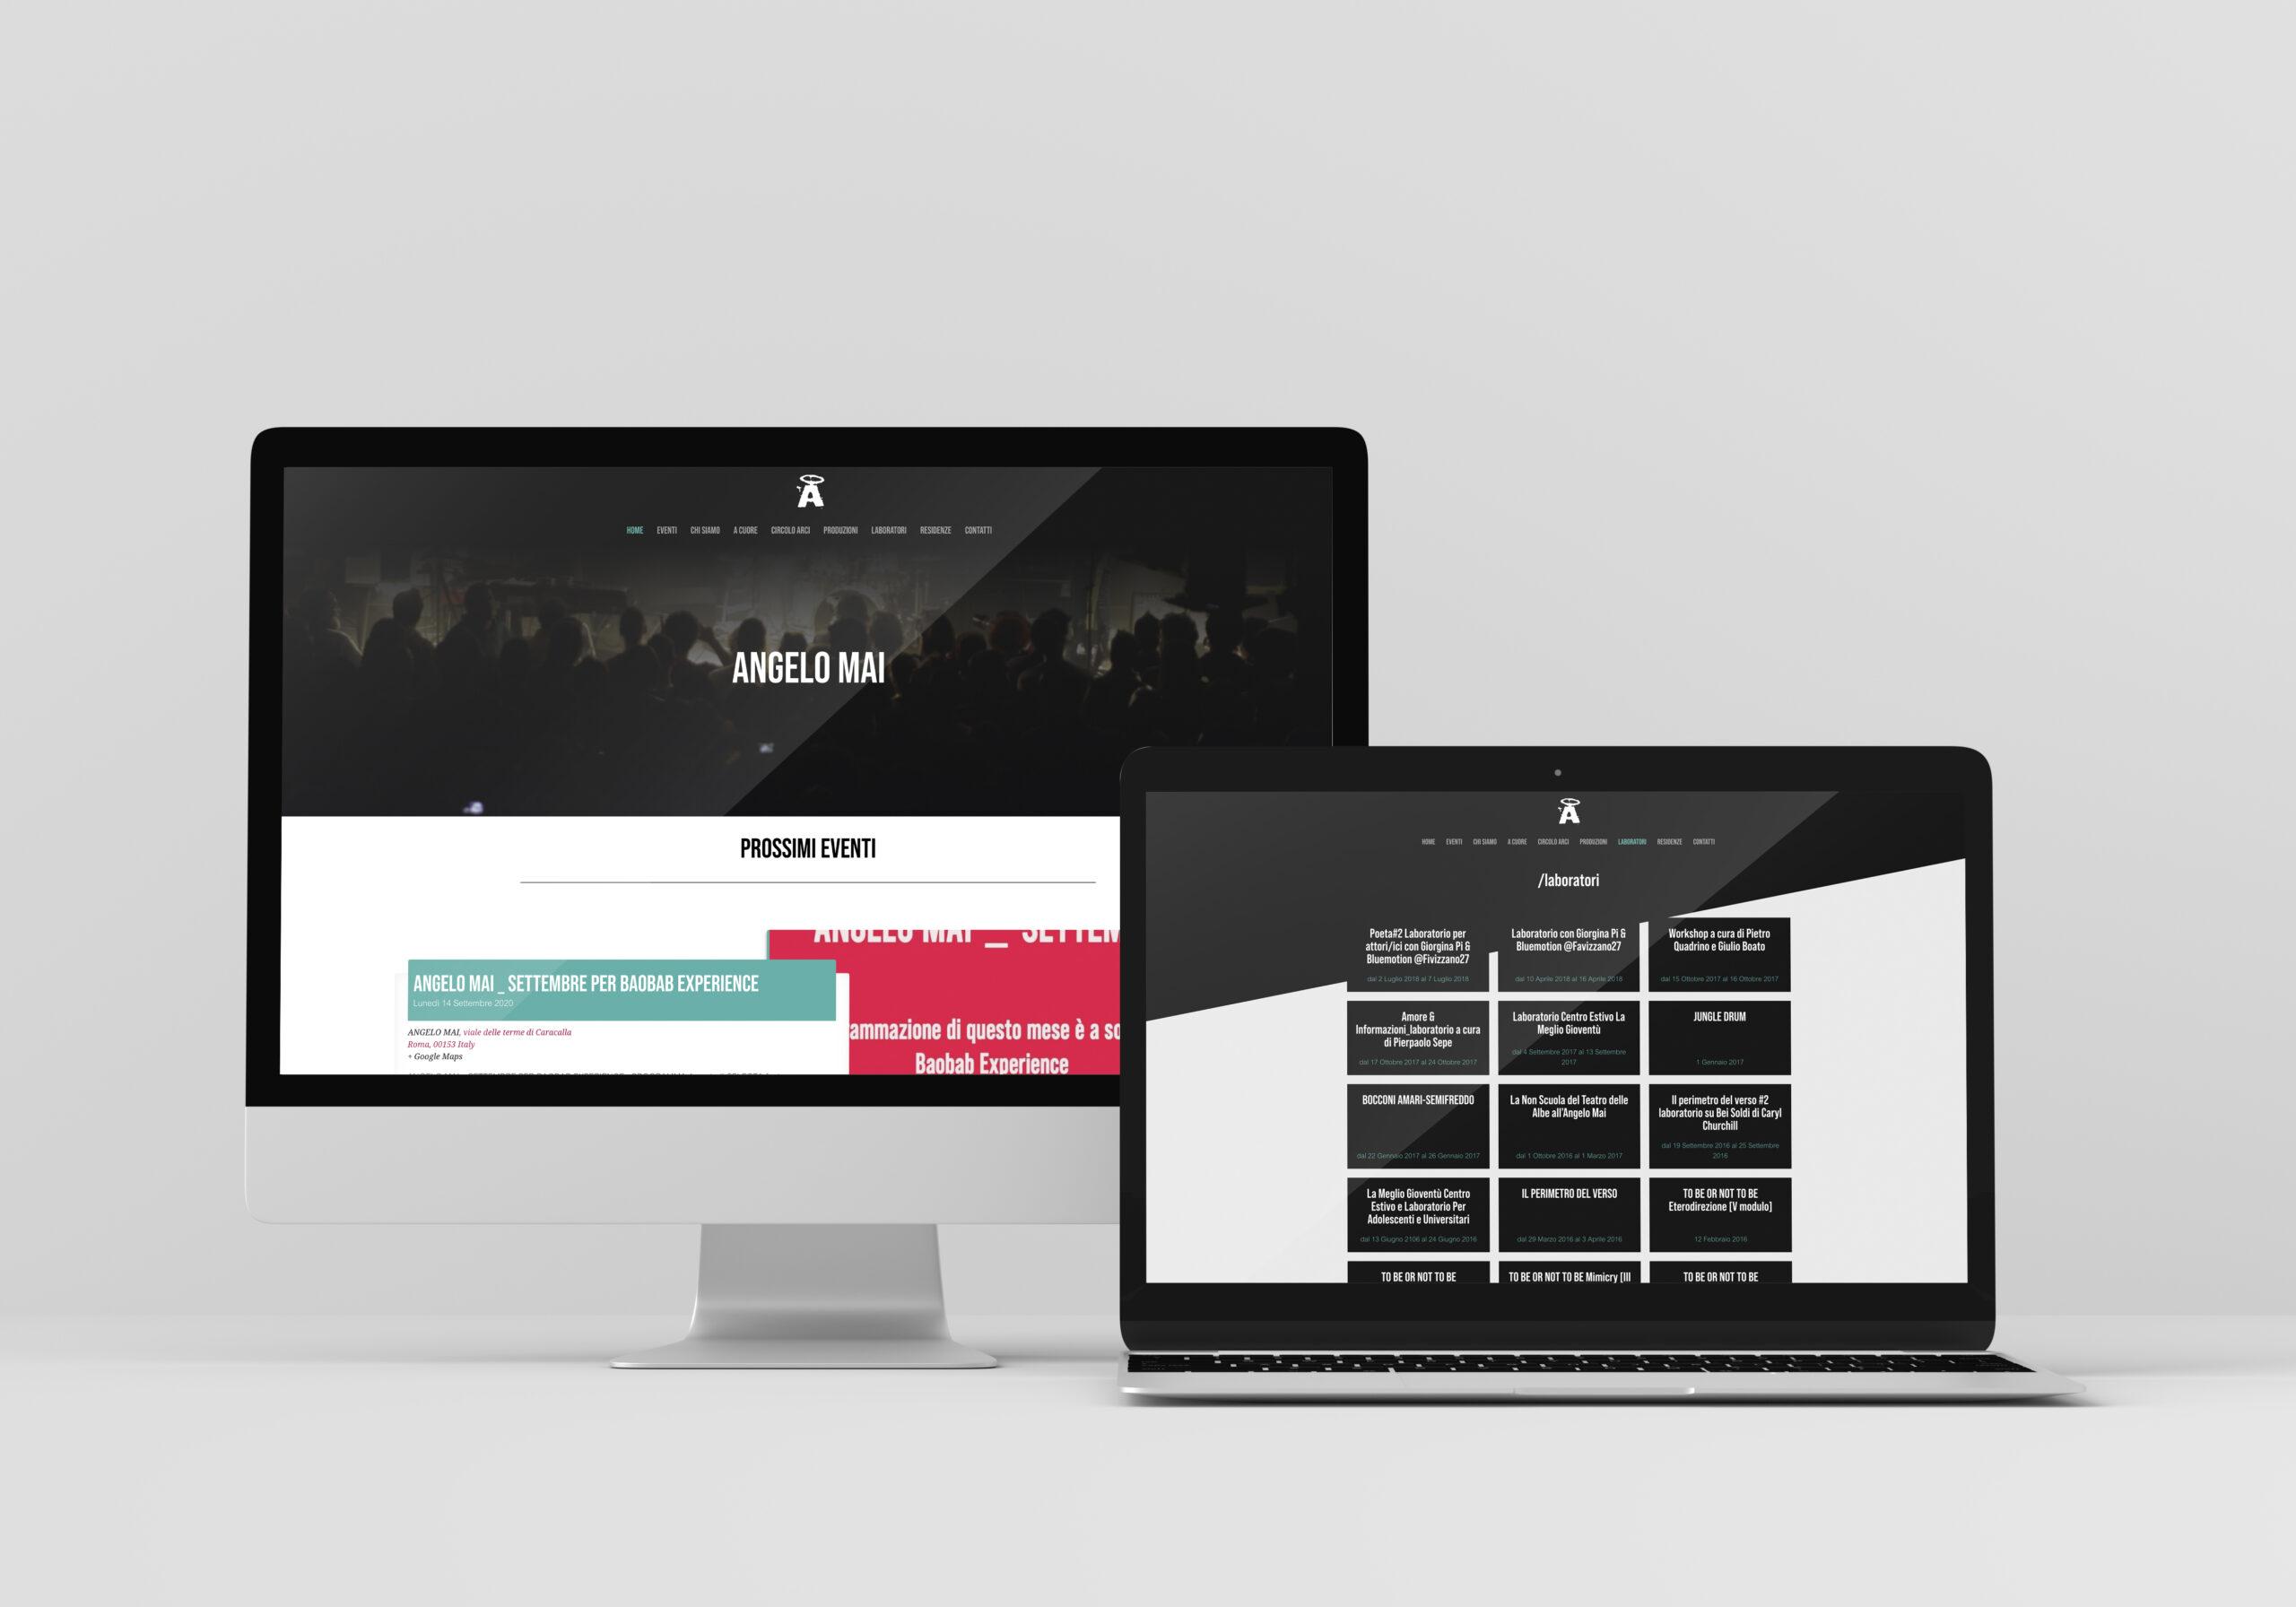 sito web angelomai